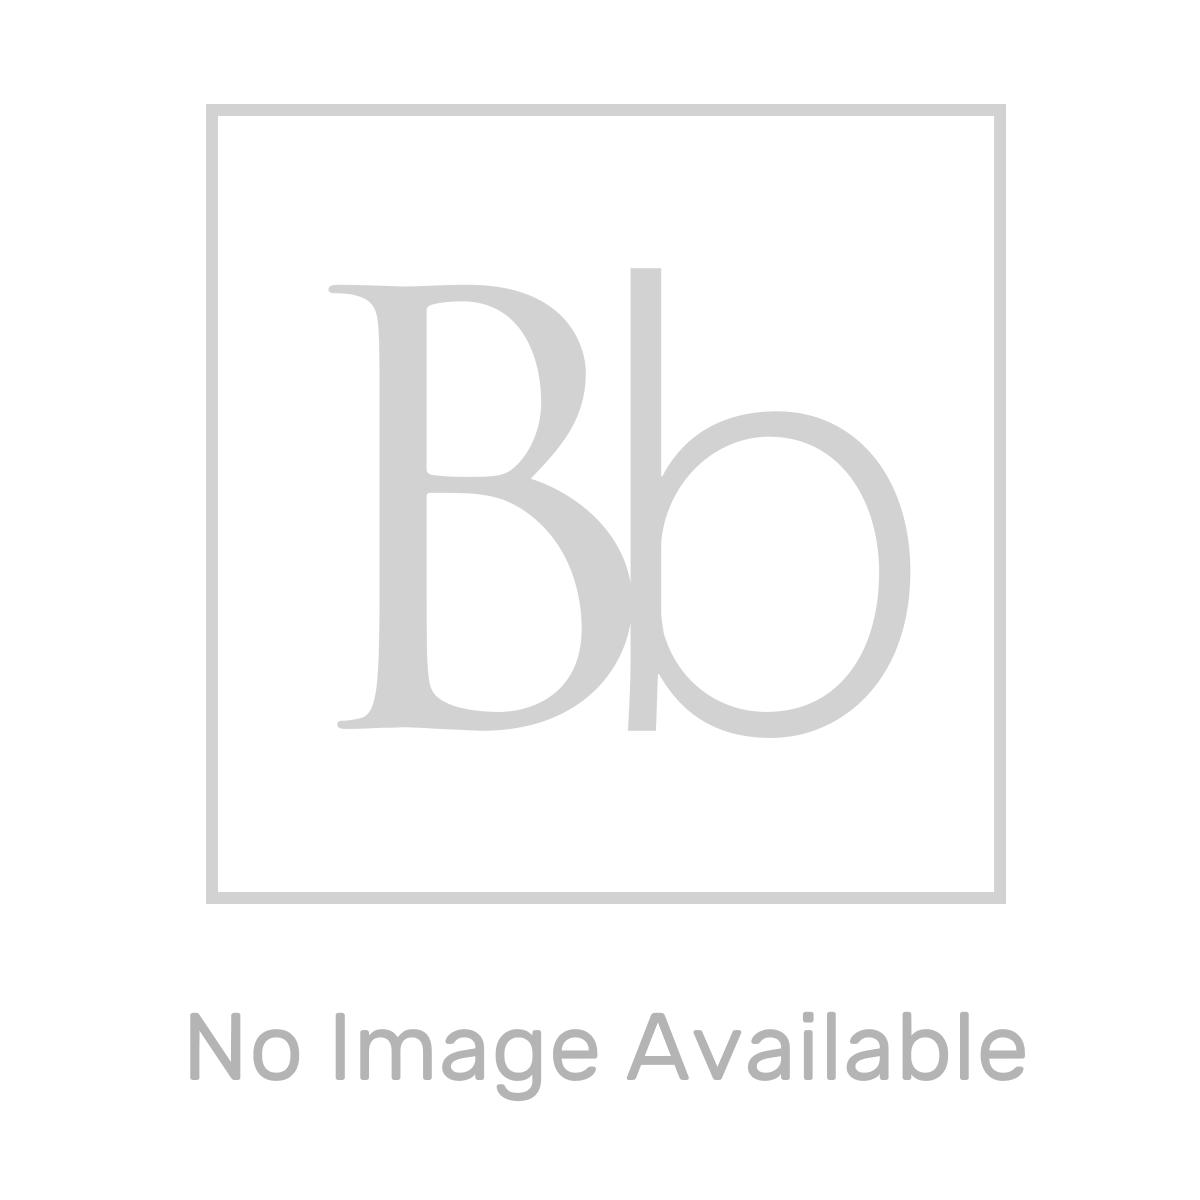 RAK Ecofix Chrome Flush Plate with Rectangular Push Buttons